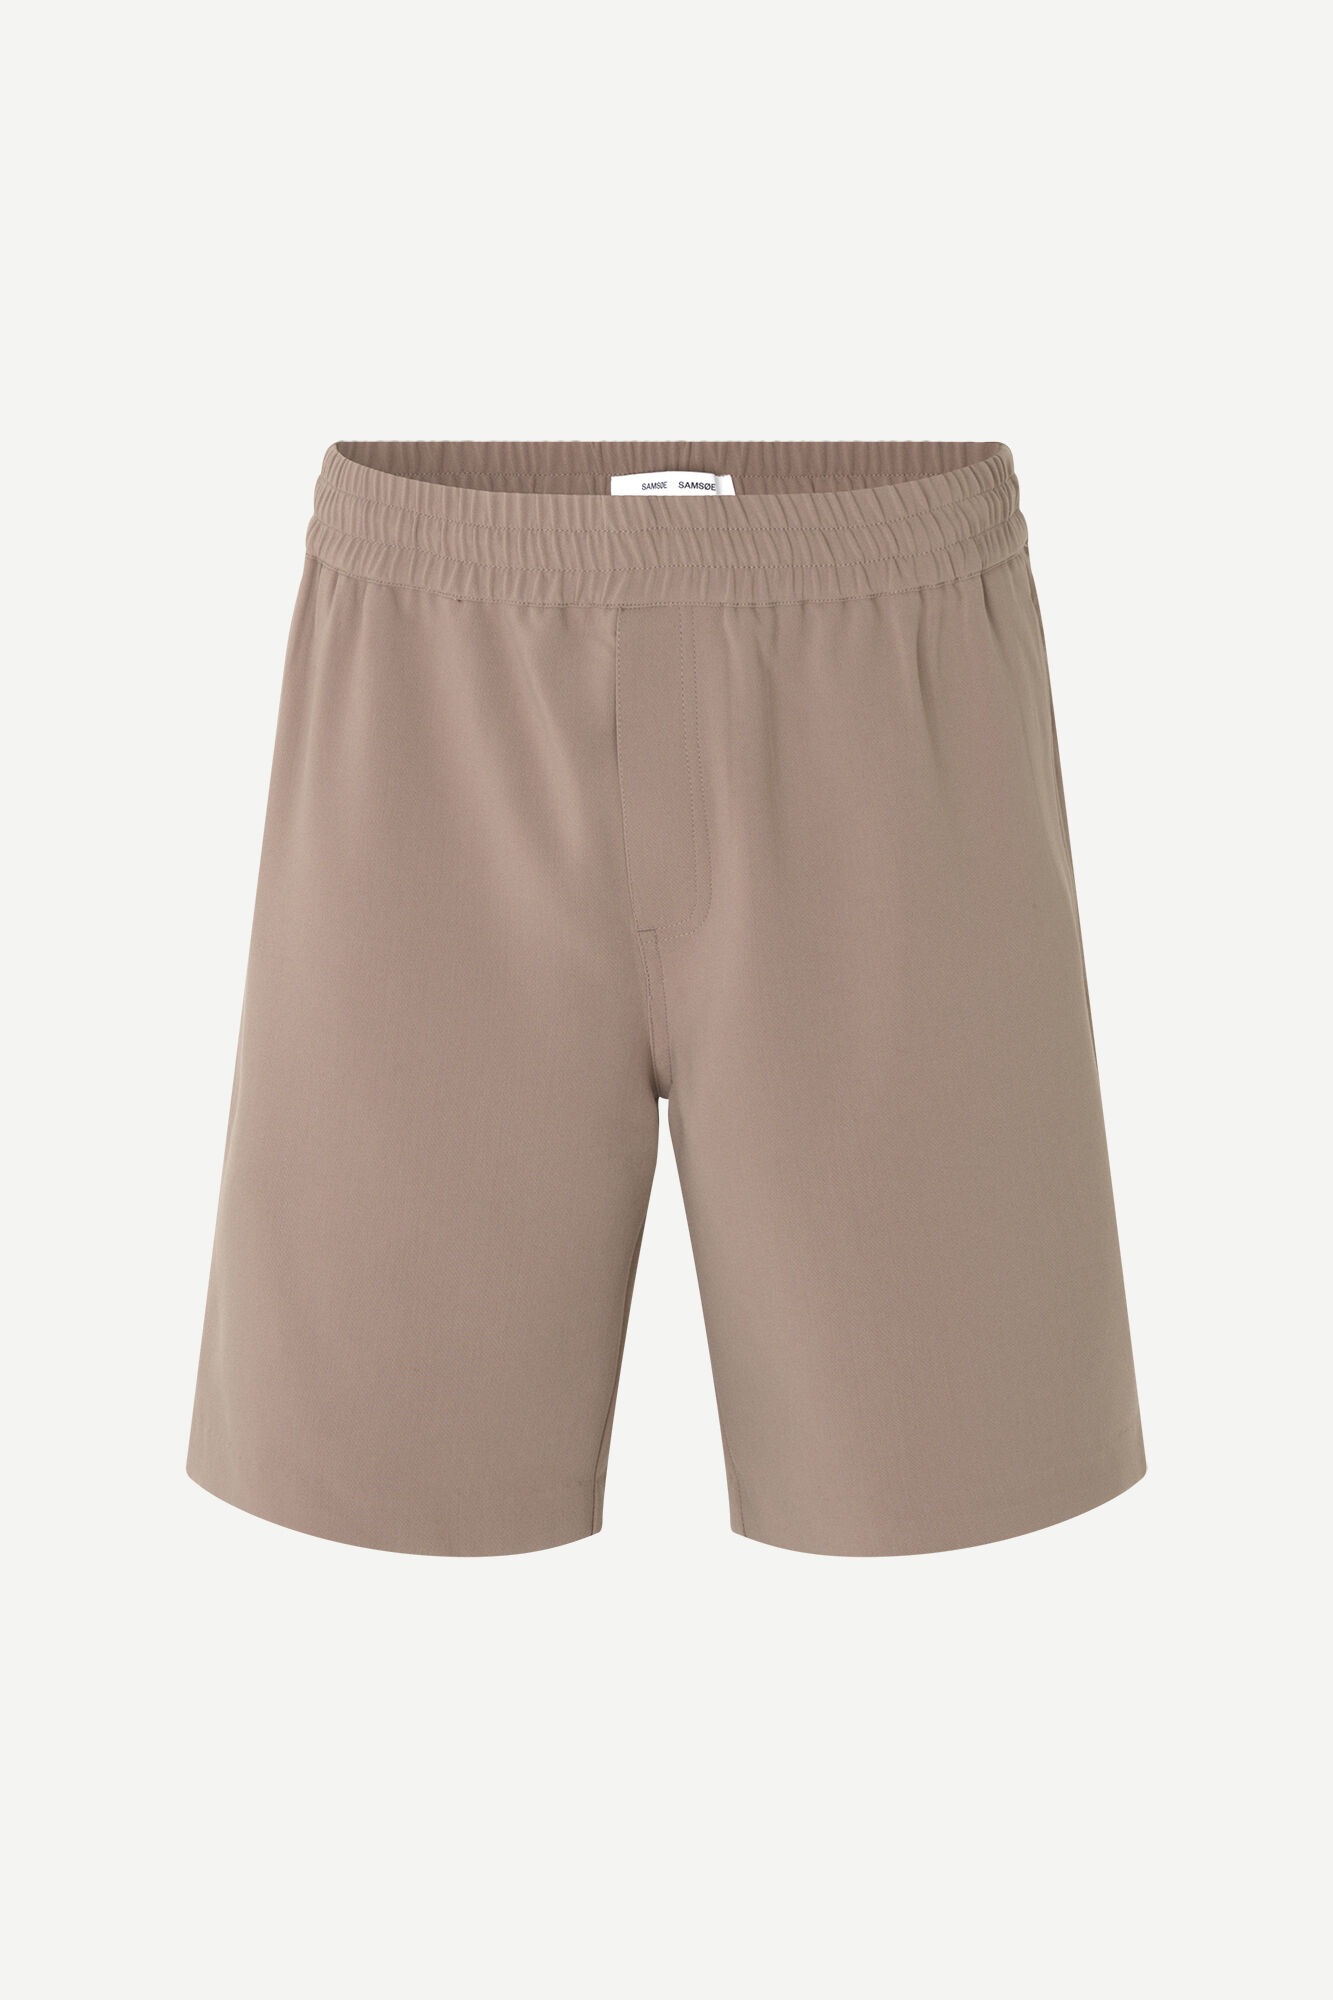 Smith Summer Shorts Caribou Brown-1